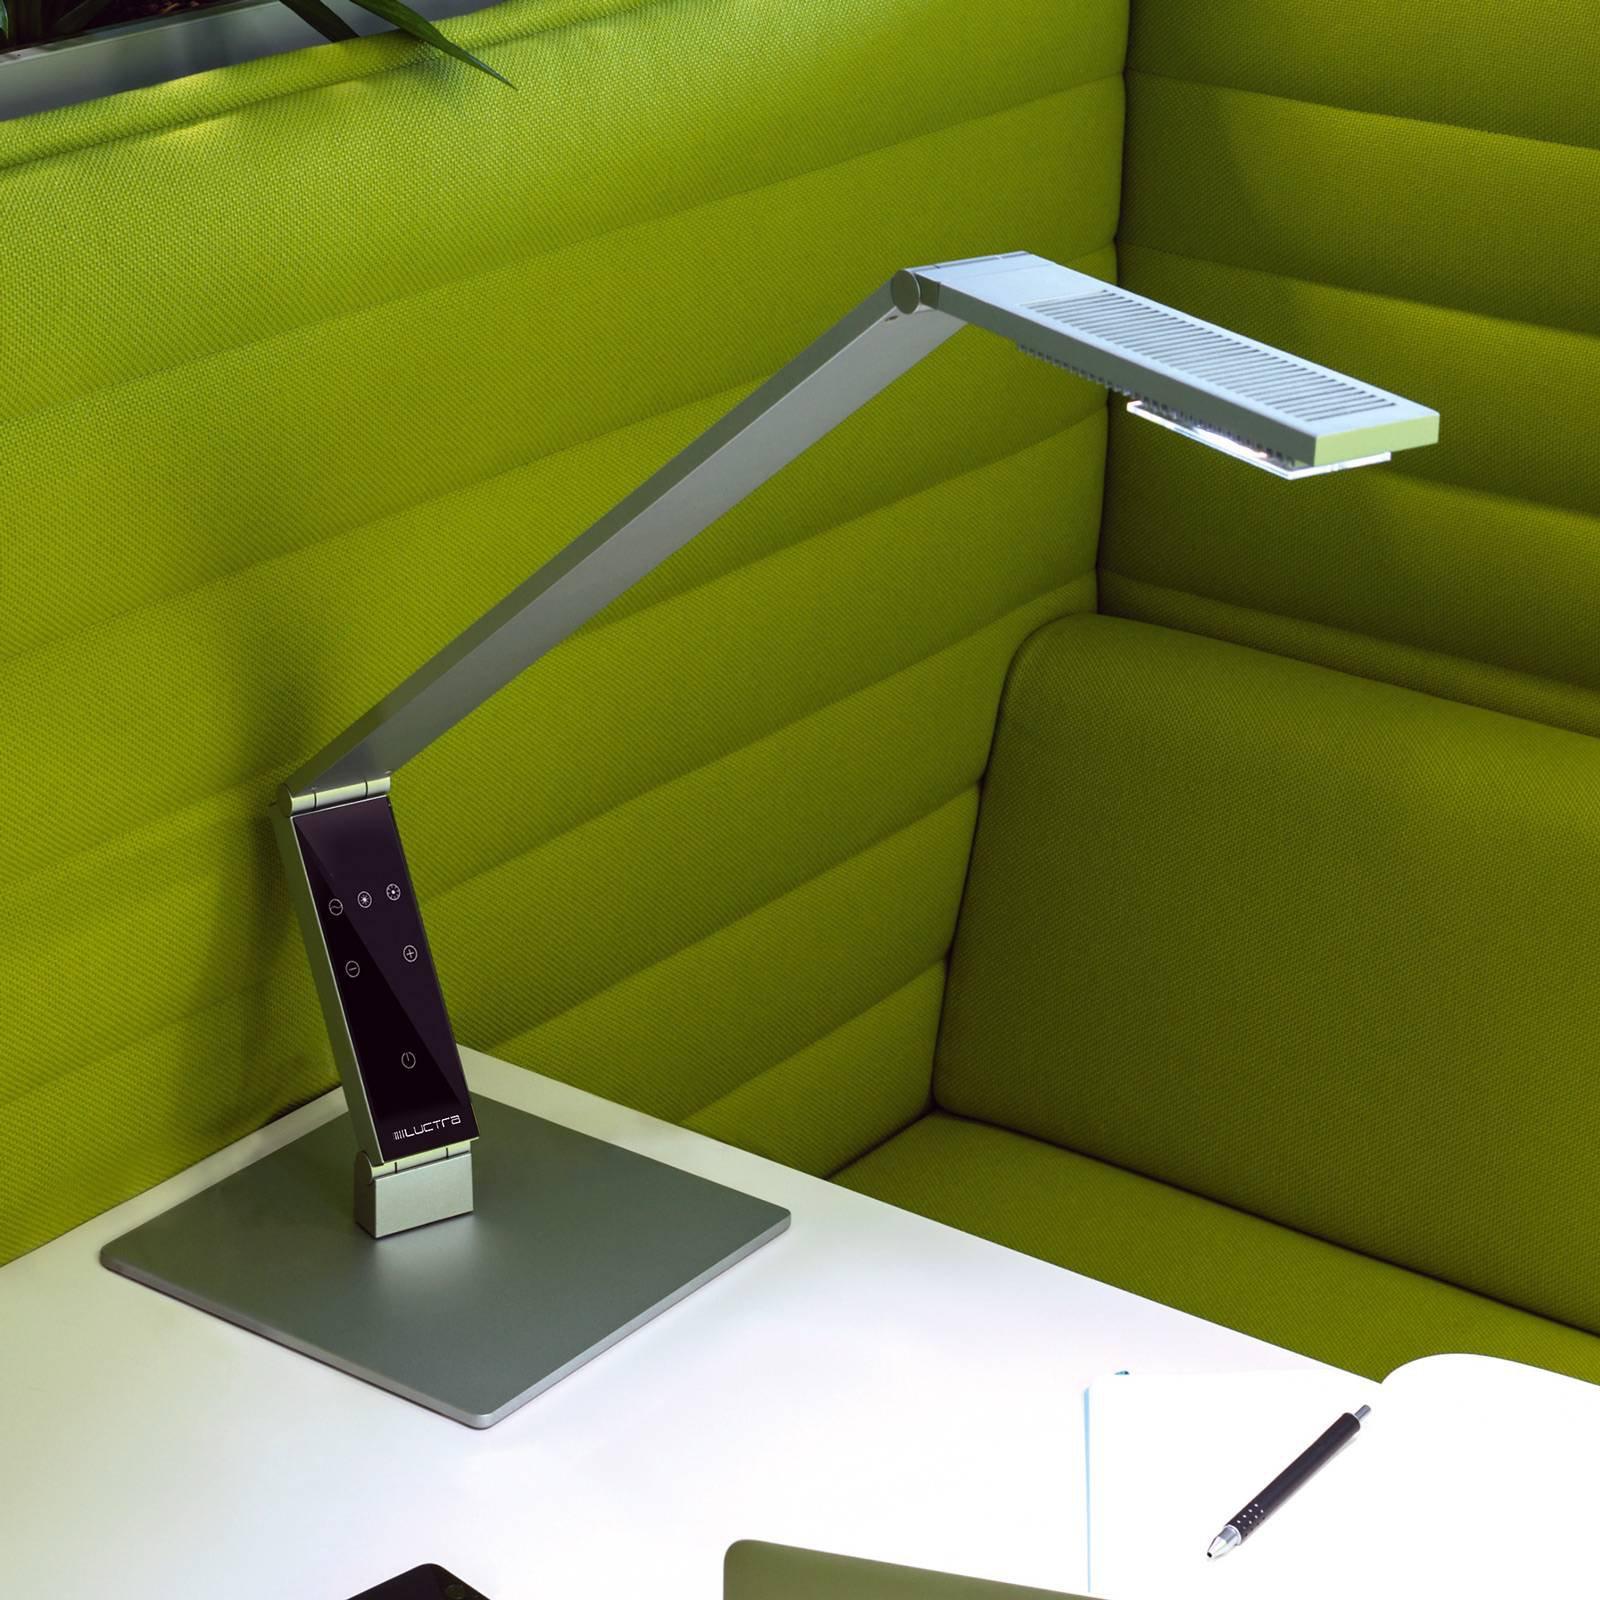 Luctra Tabel Linear LED-bordlampe fot, alu